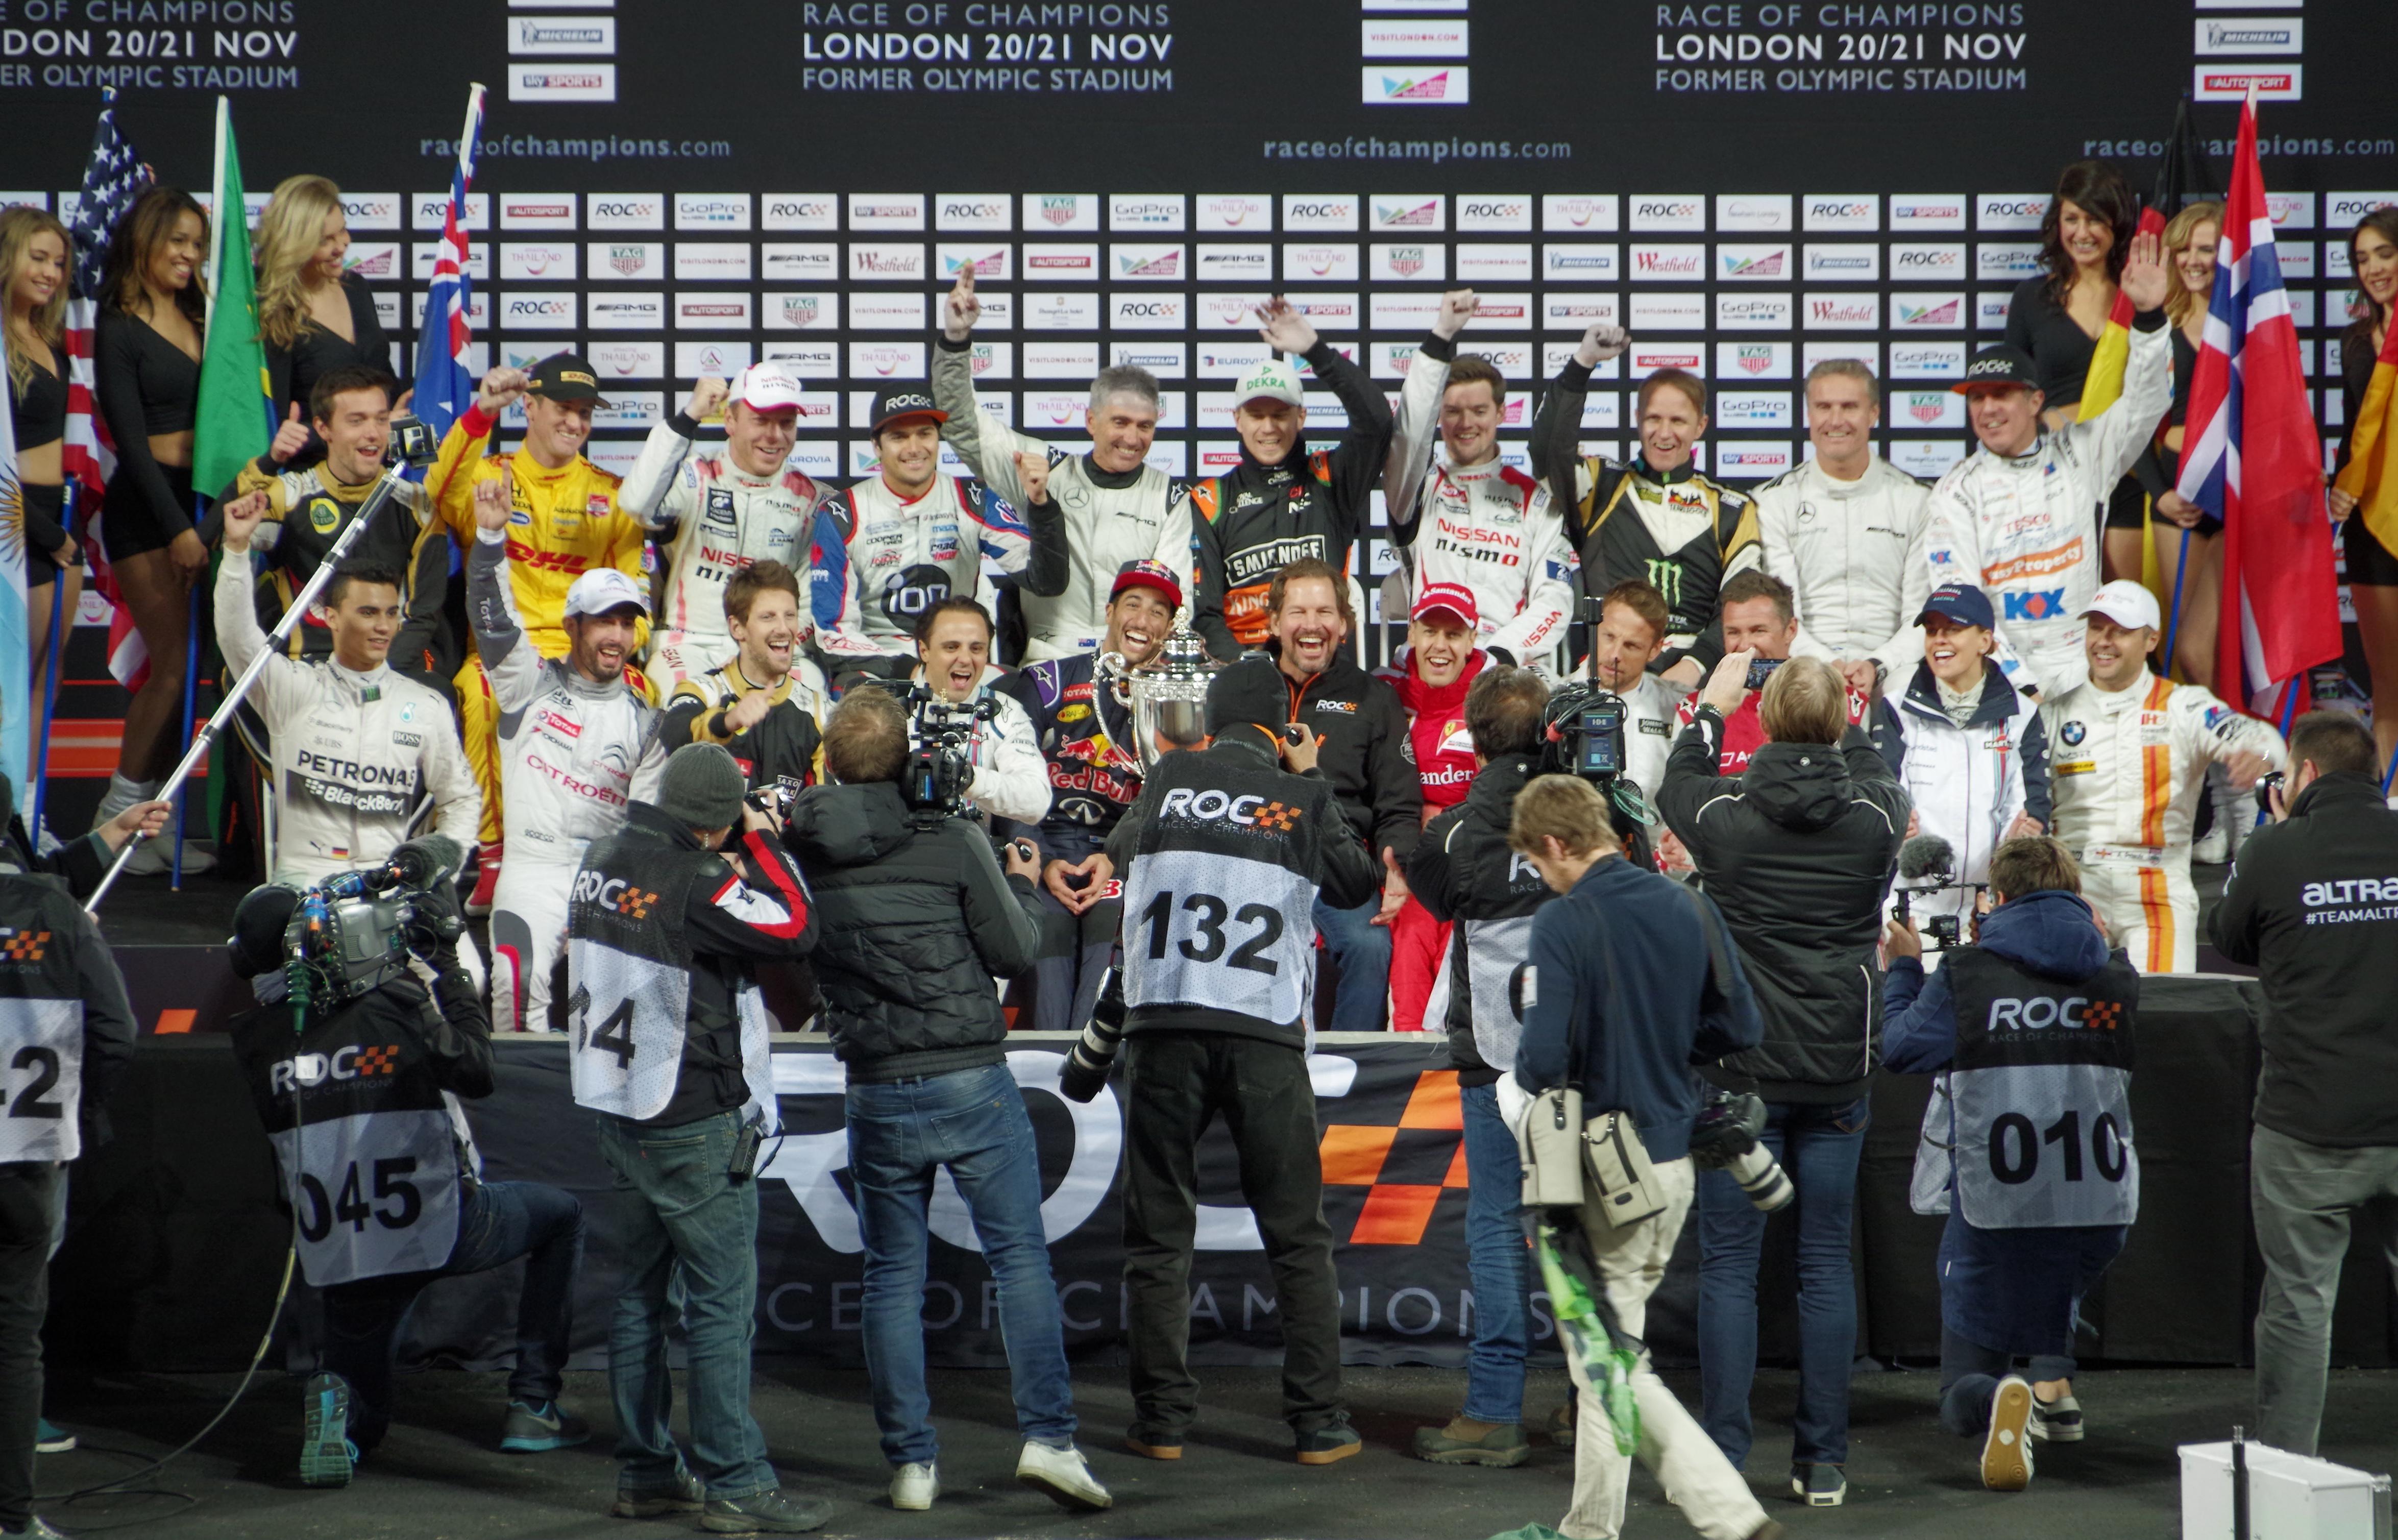 Tiedosto 2015 Race of Champions Nations Cup.jpg – Wikipedia 34cc7b450c